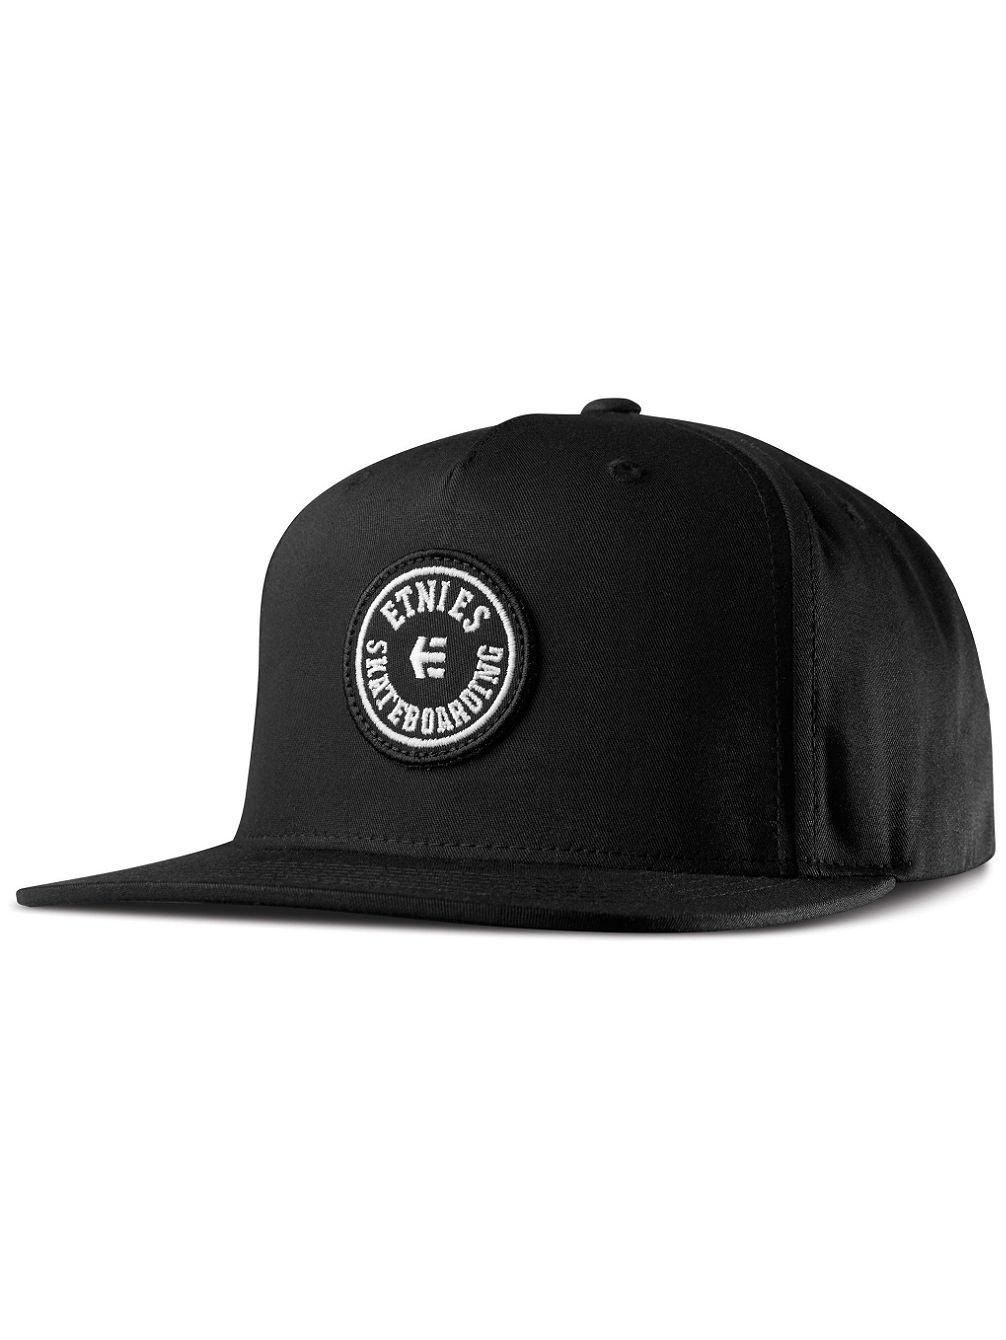 etnies-scout-snapback-cap